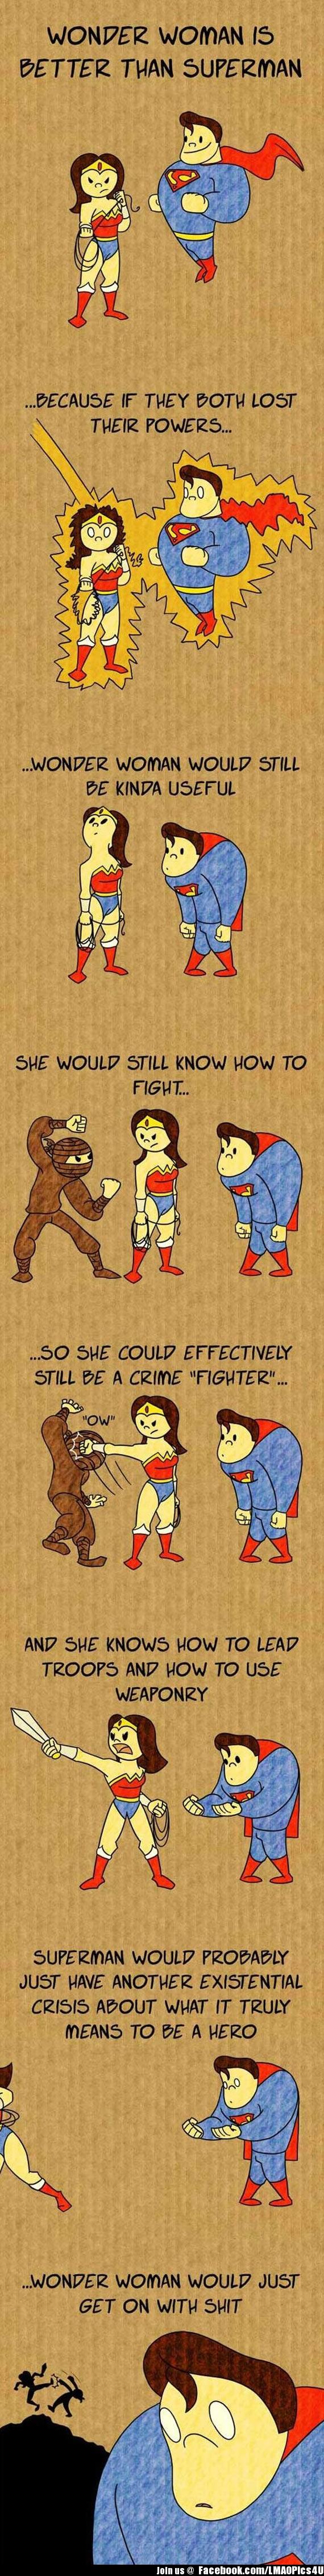 Wonder Woman vs. SuperMan - Humorous Funny Jokes